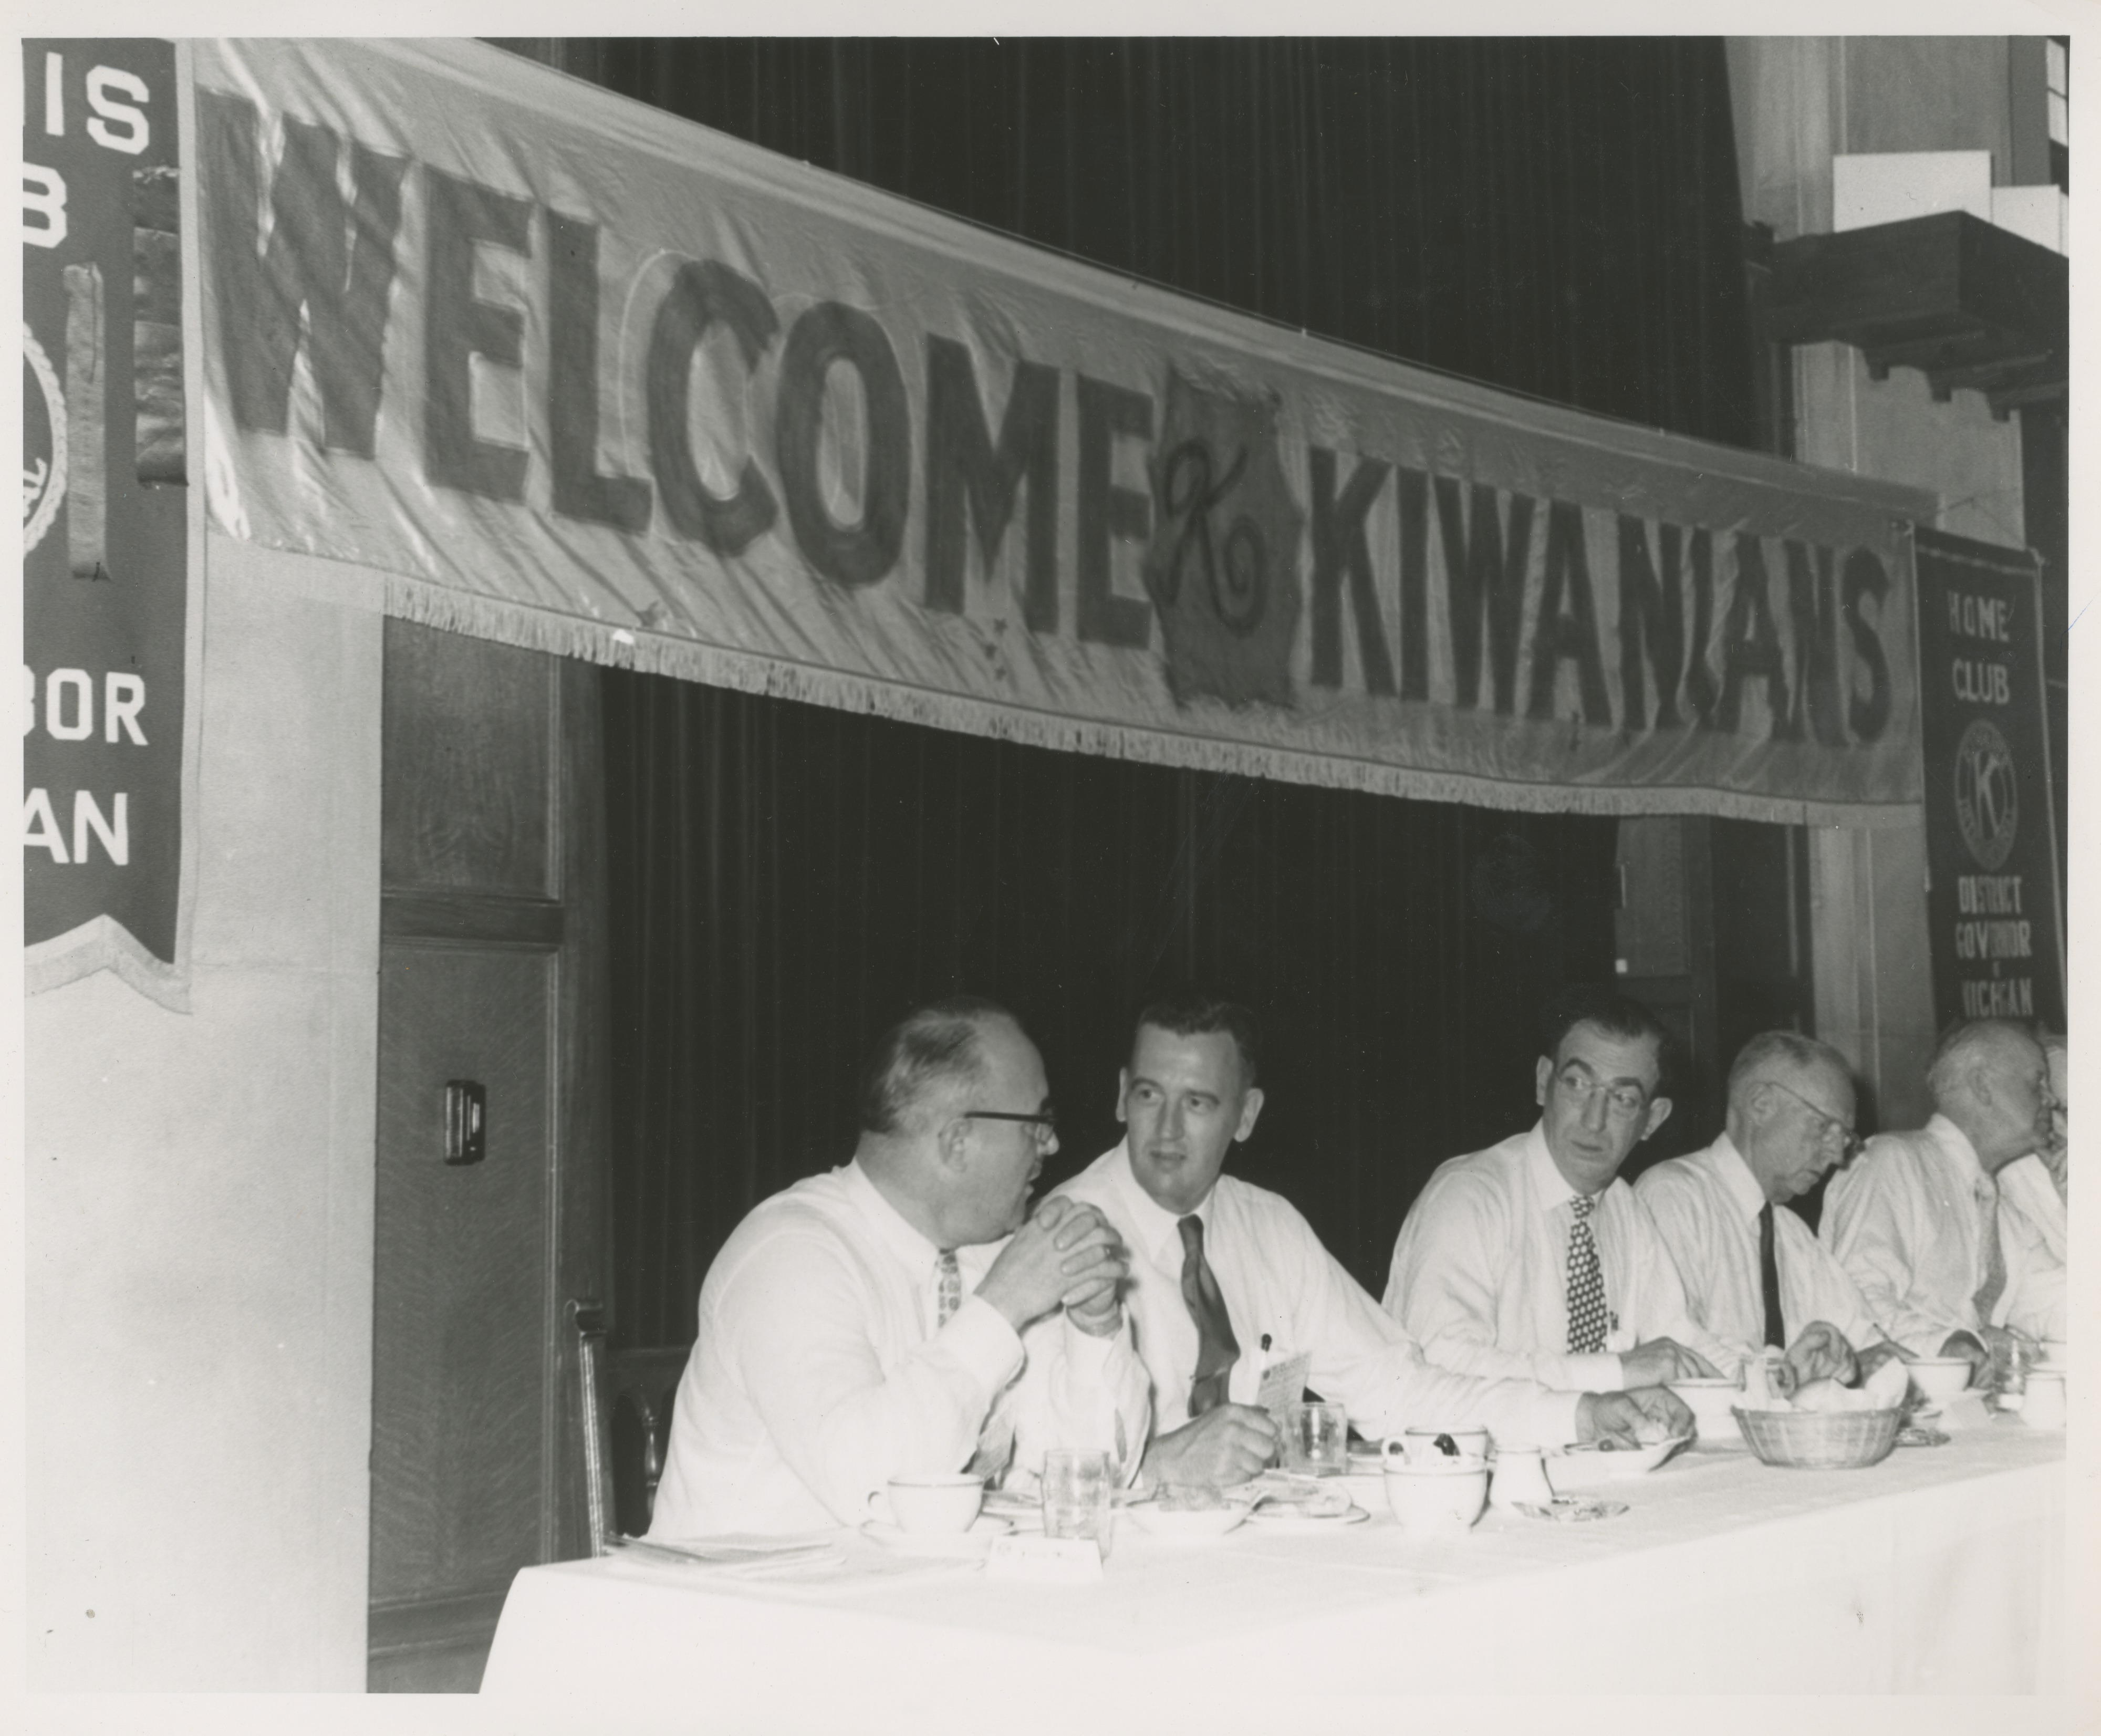 Kiwanis International District Convention at Michigan Union, 1953